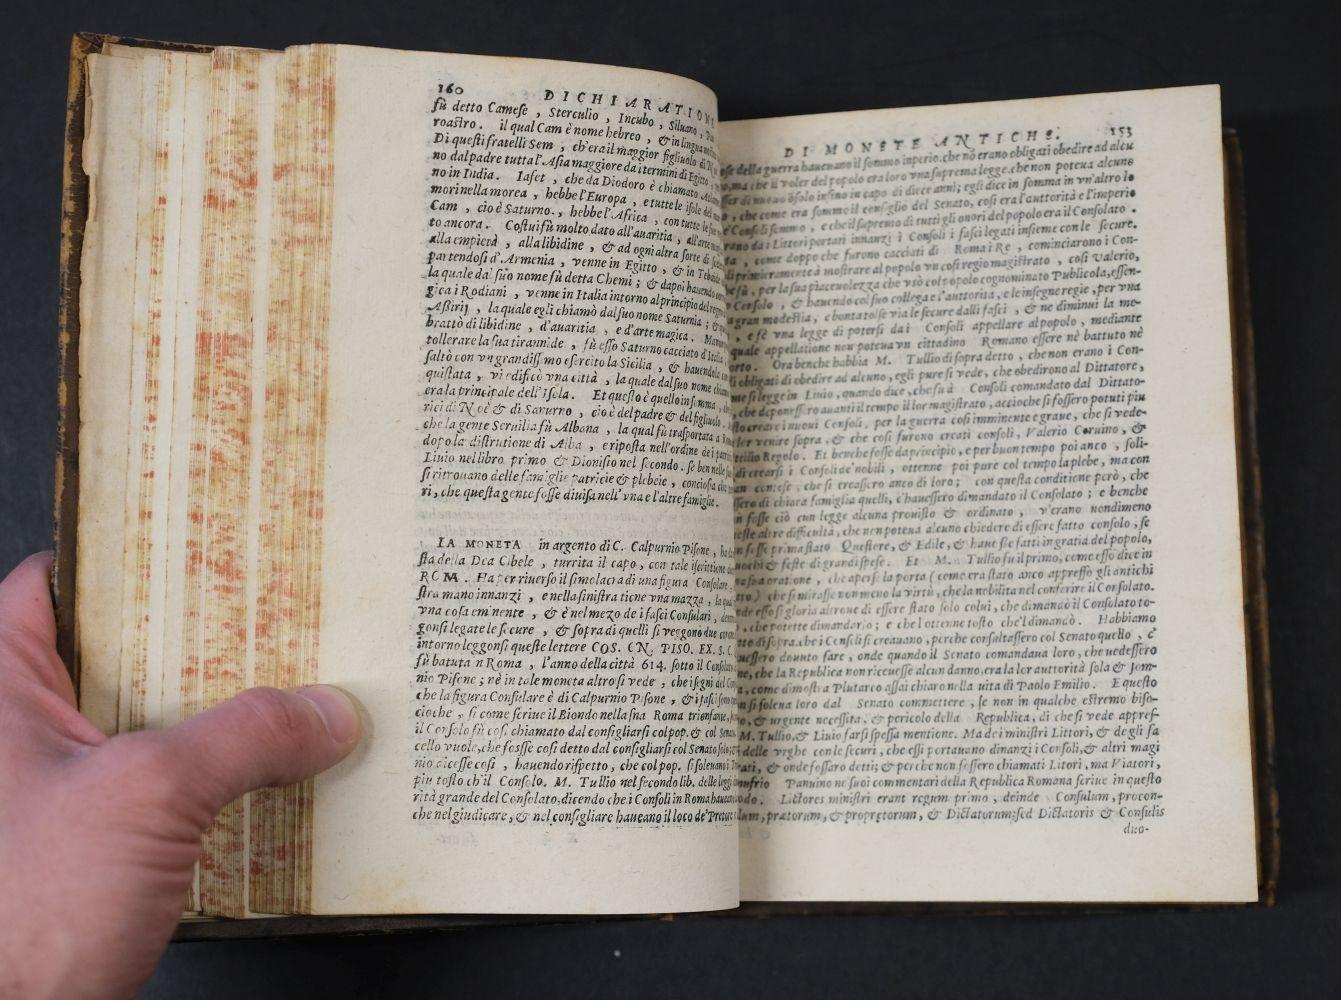 Erizzo (Sebastiano). Discorso sopra le medaglie, 4th edition, 1584, ex libris Fletcher of Saltoun - Image 9 of 11